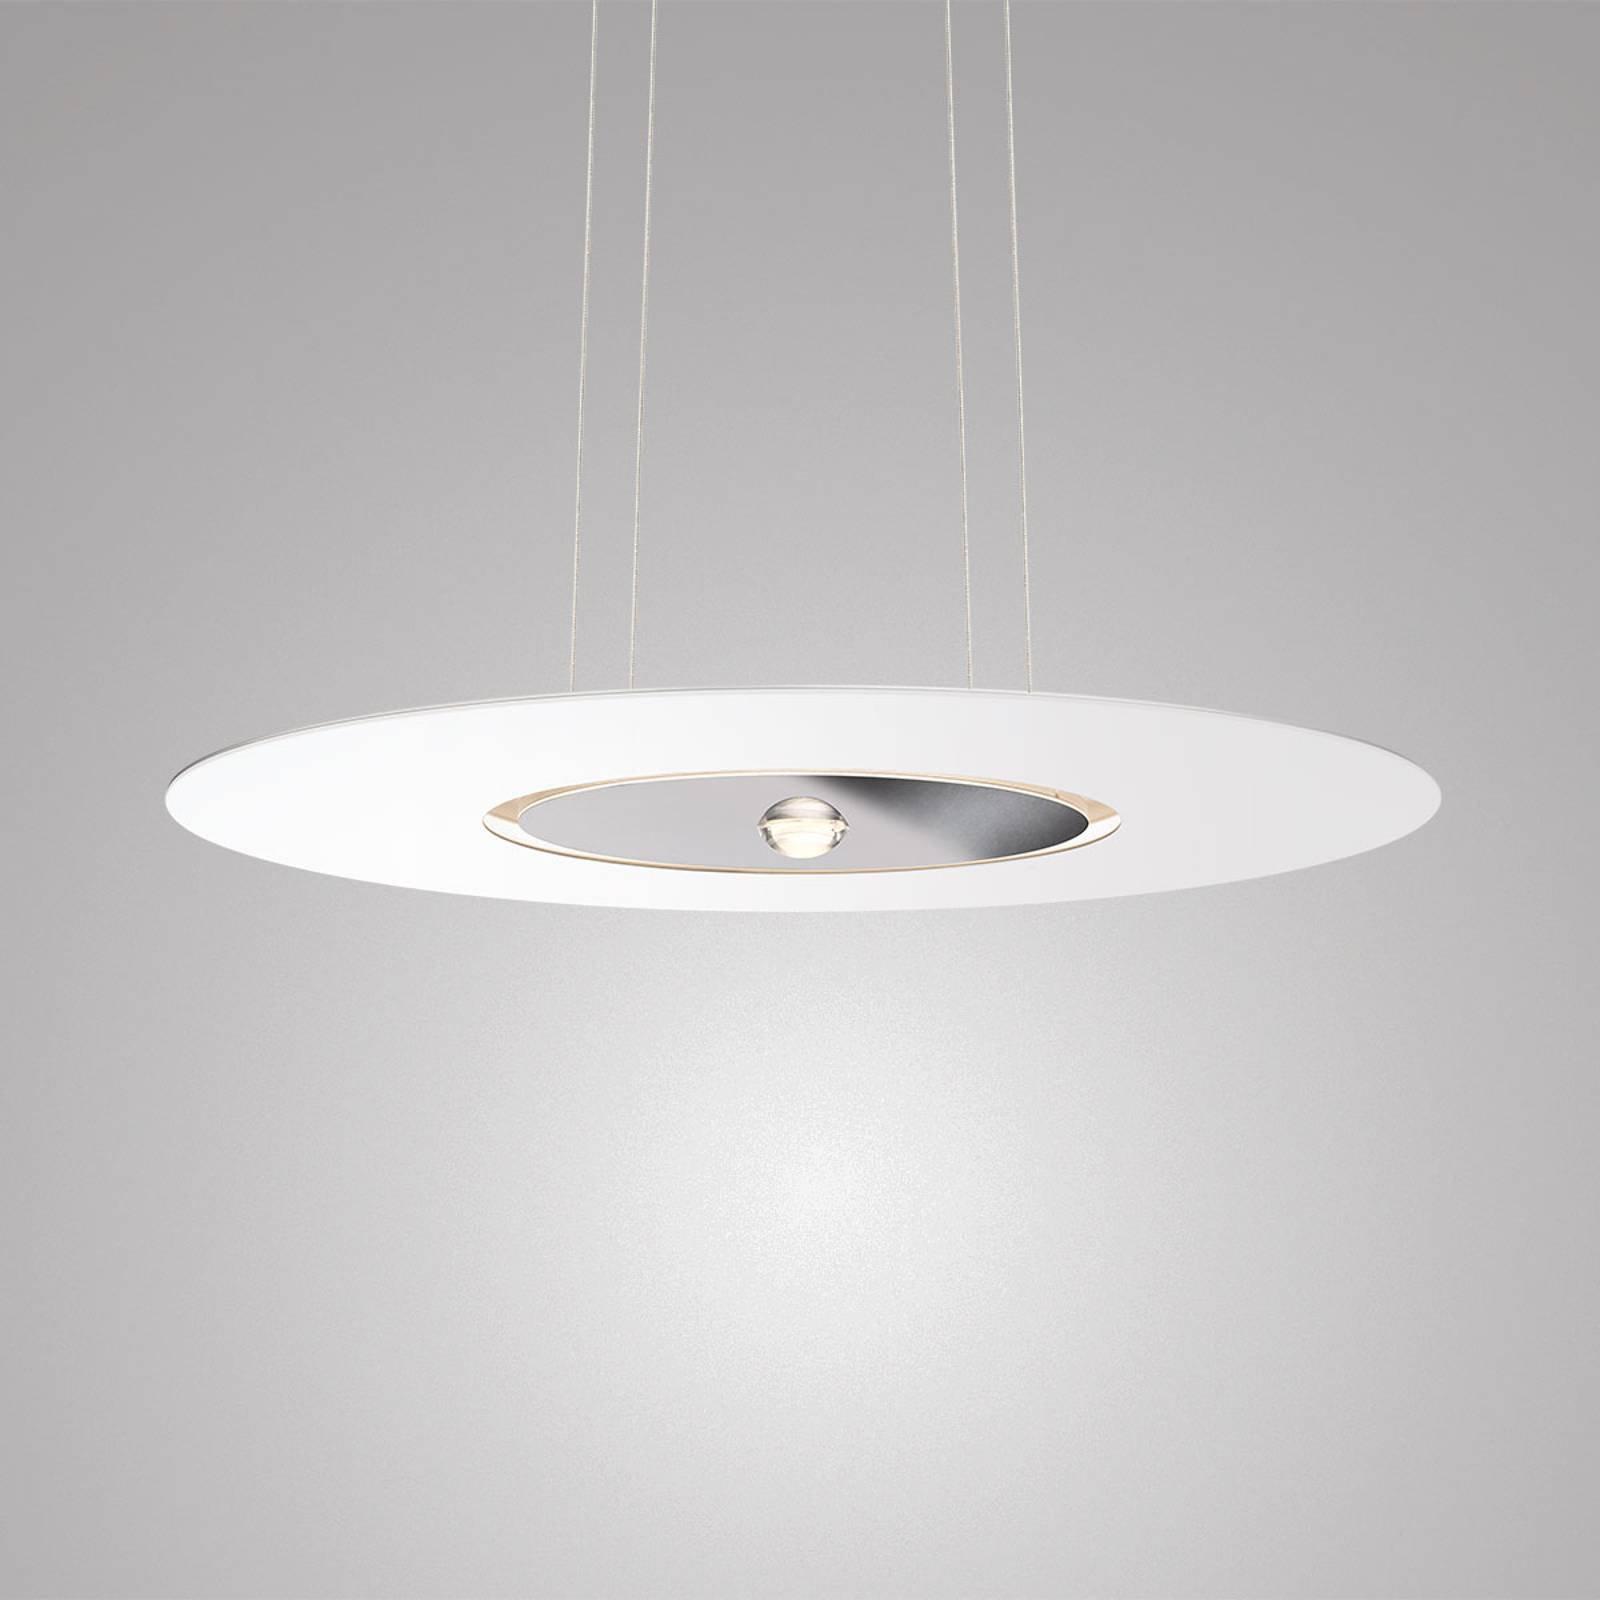 Cini&Nils Passepartout55 LED-hengelampe Casambi